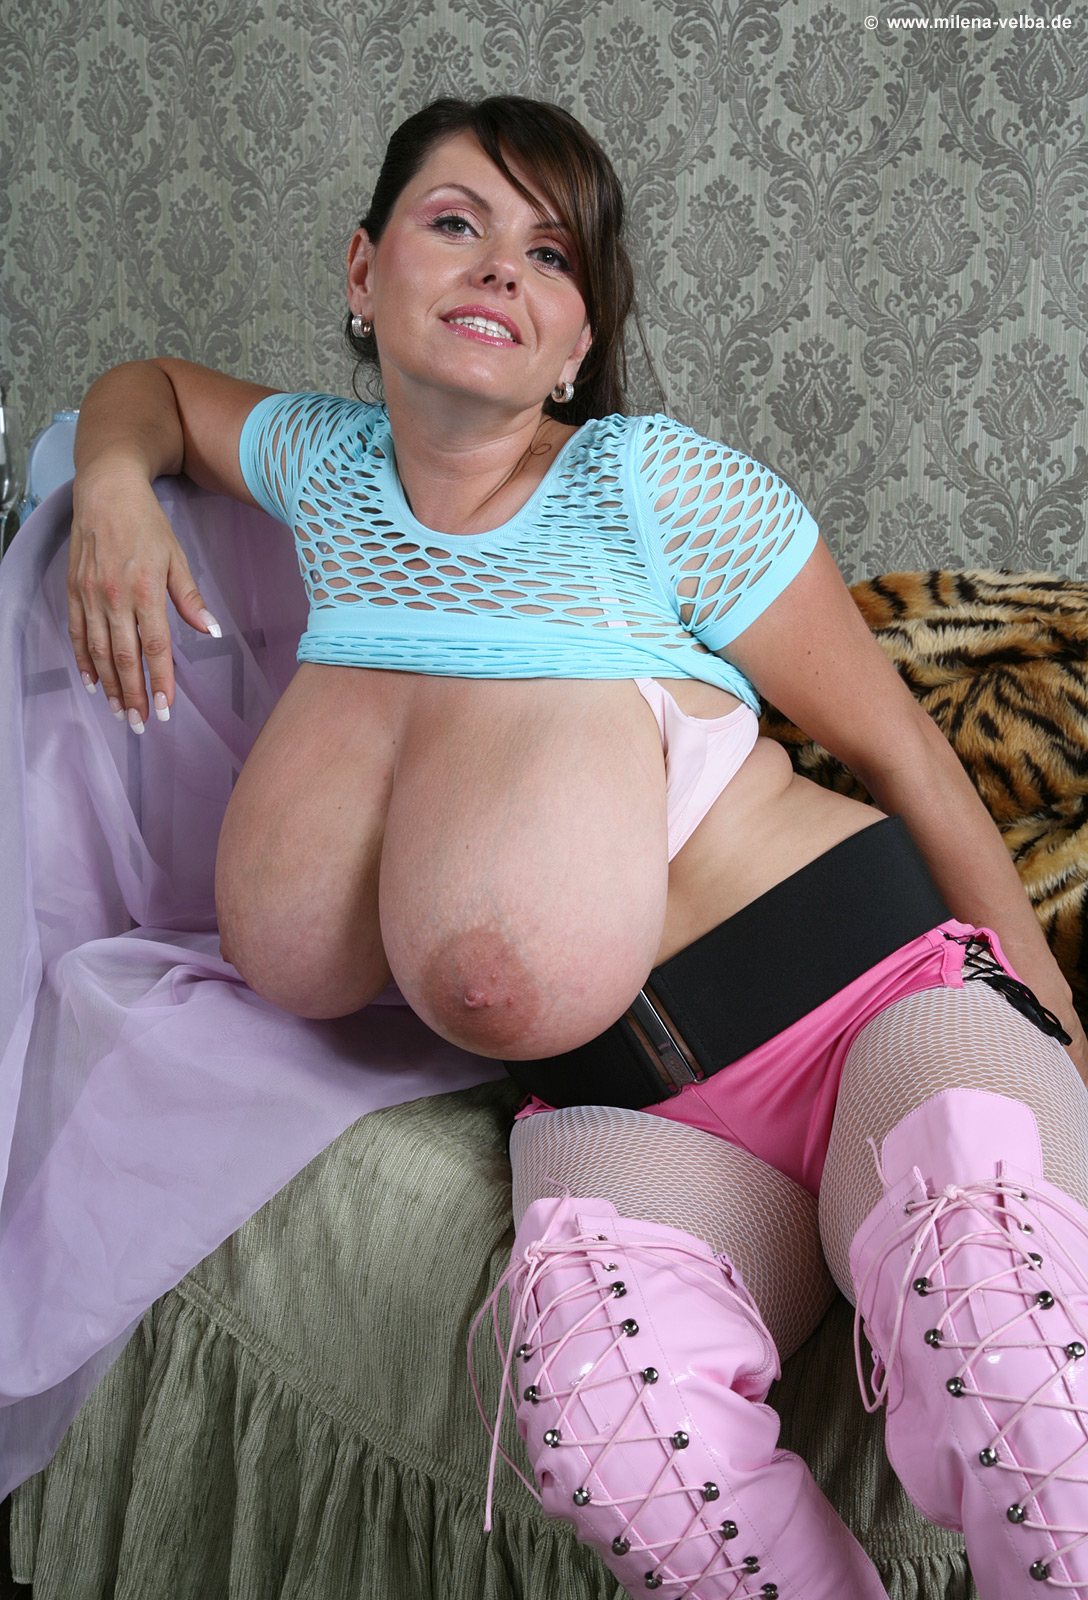 ogromnie-mamini-grudi